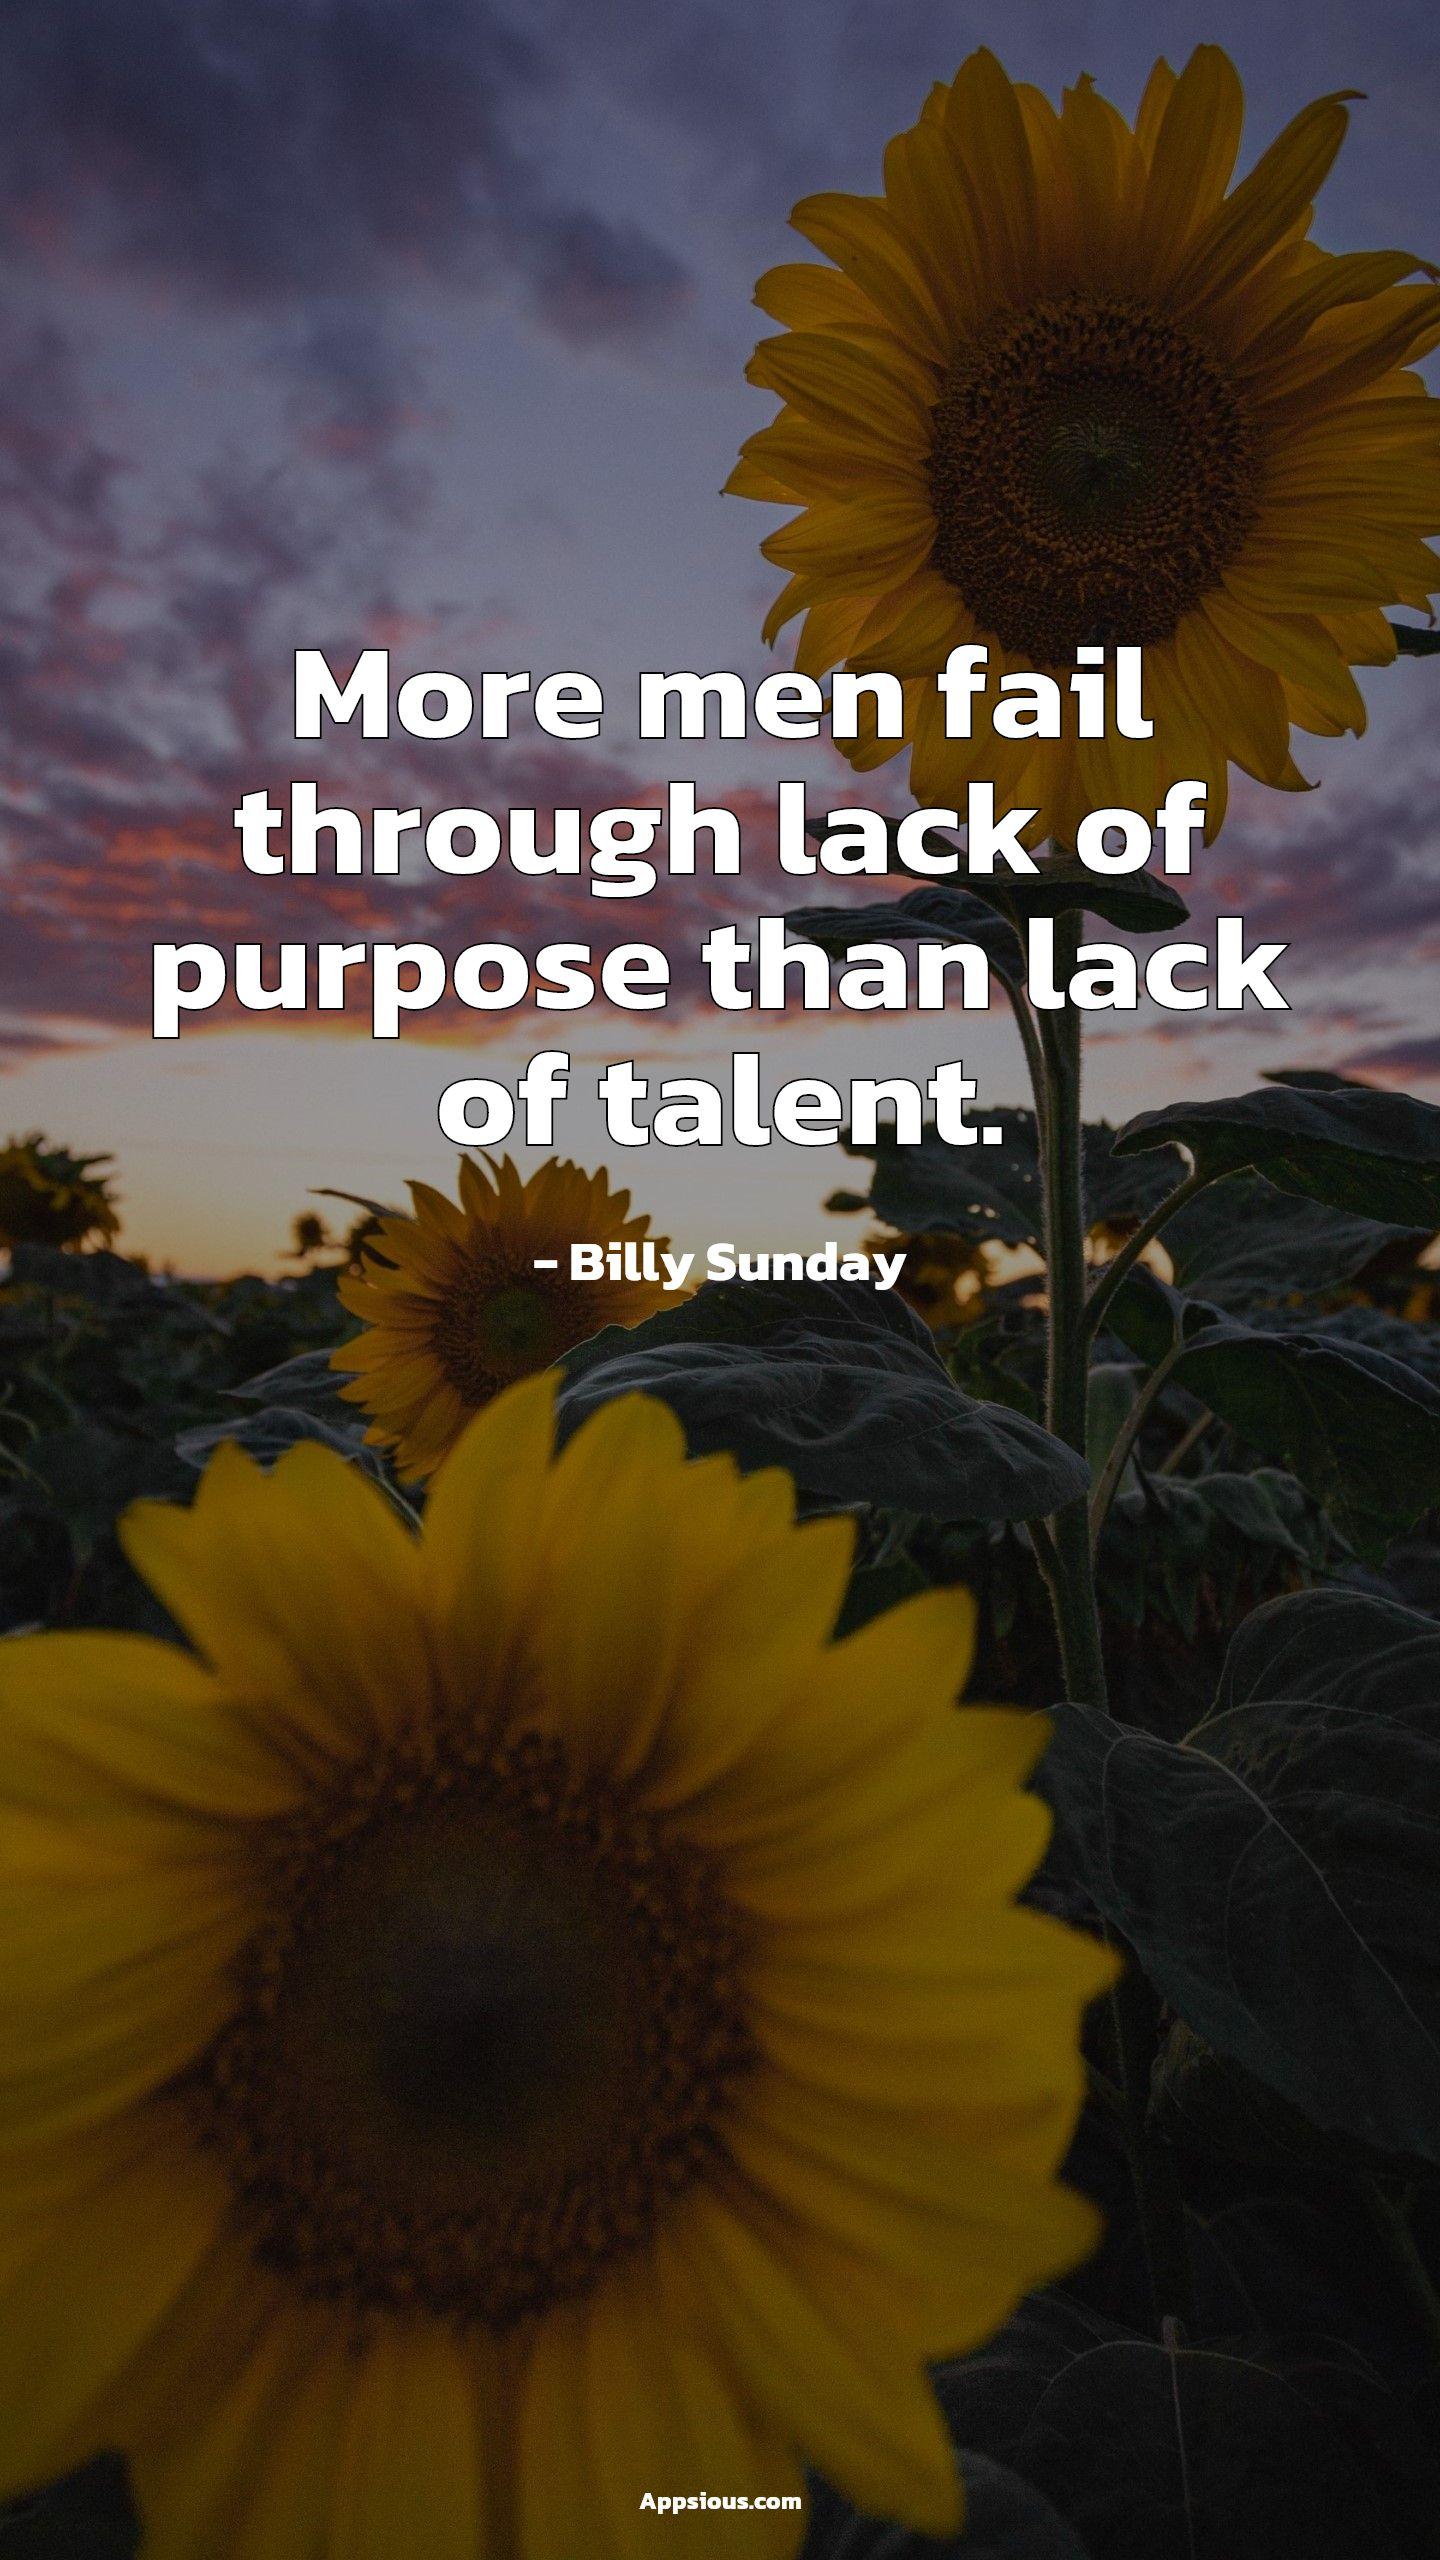 More men fail through lack of purpose than lack of talent.